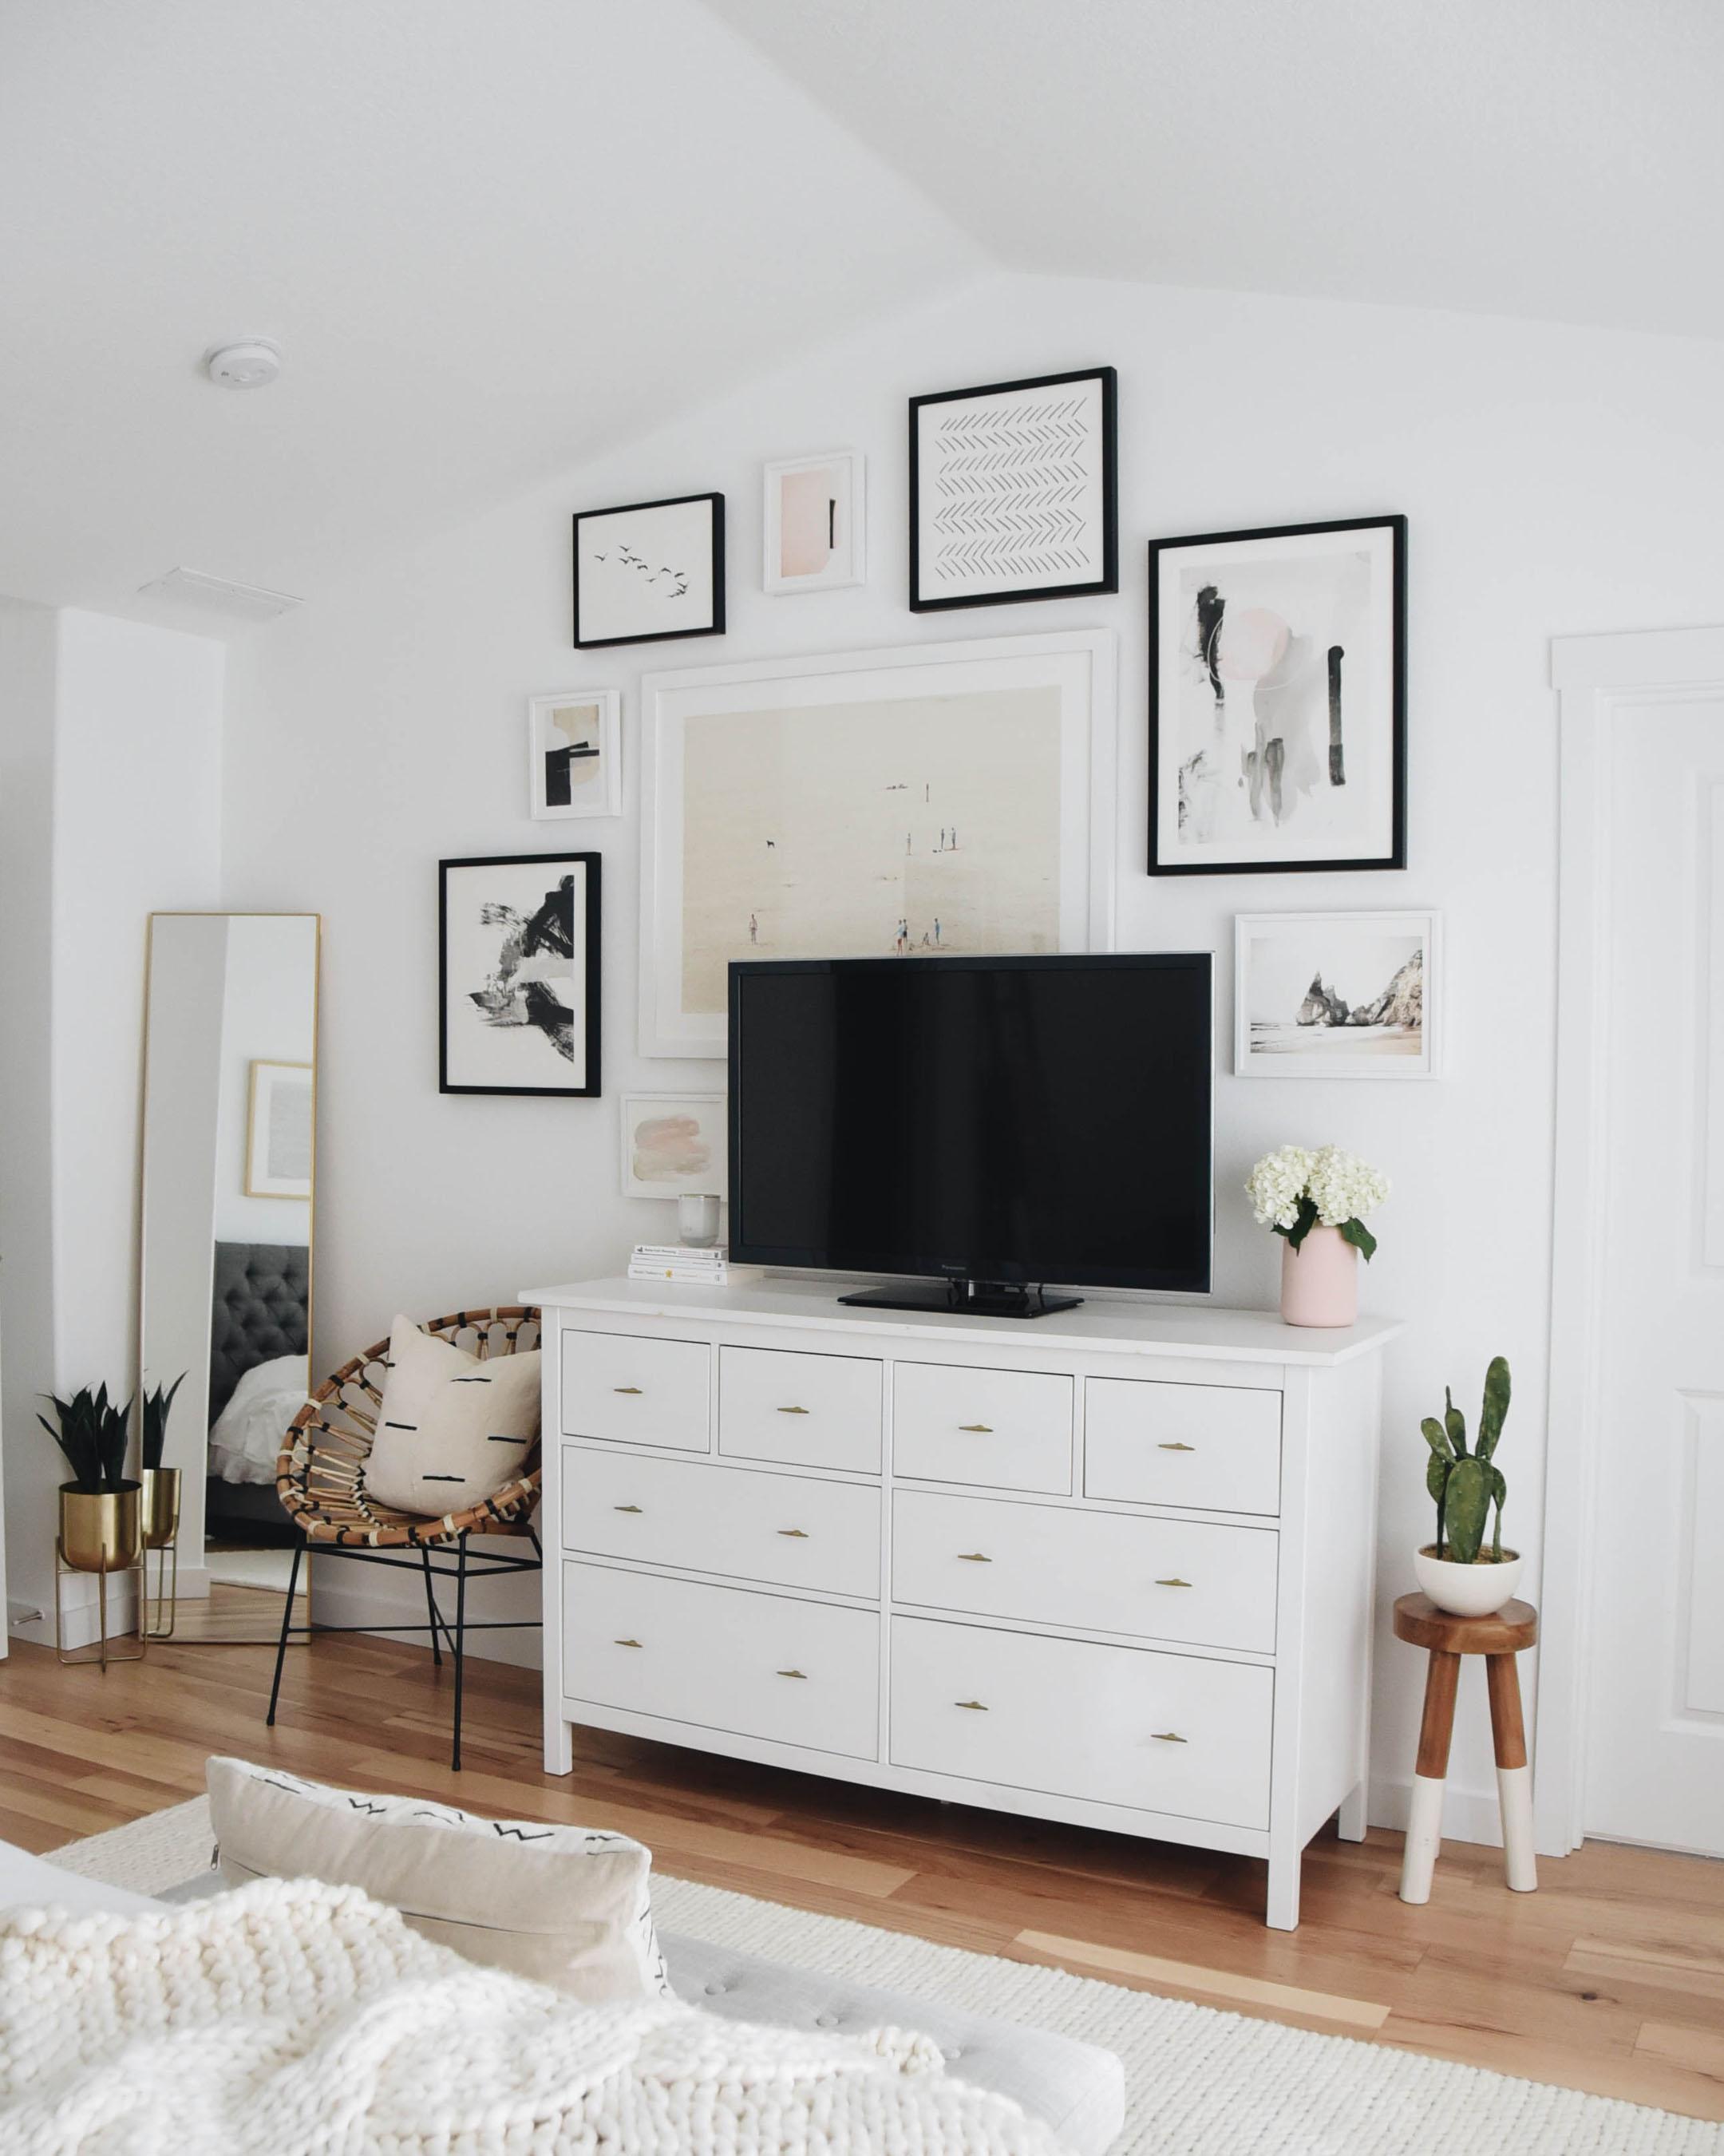 Crystalin Marie Master Bedroom Gallery Wall